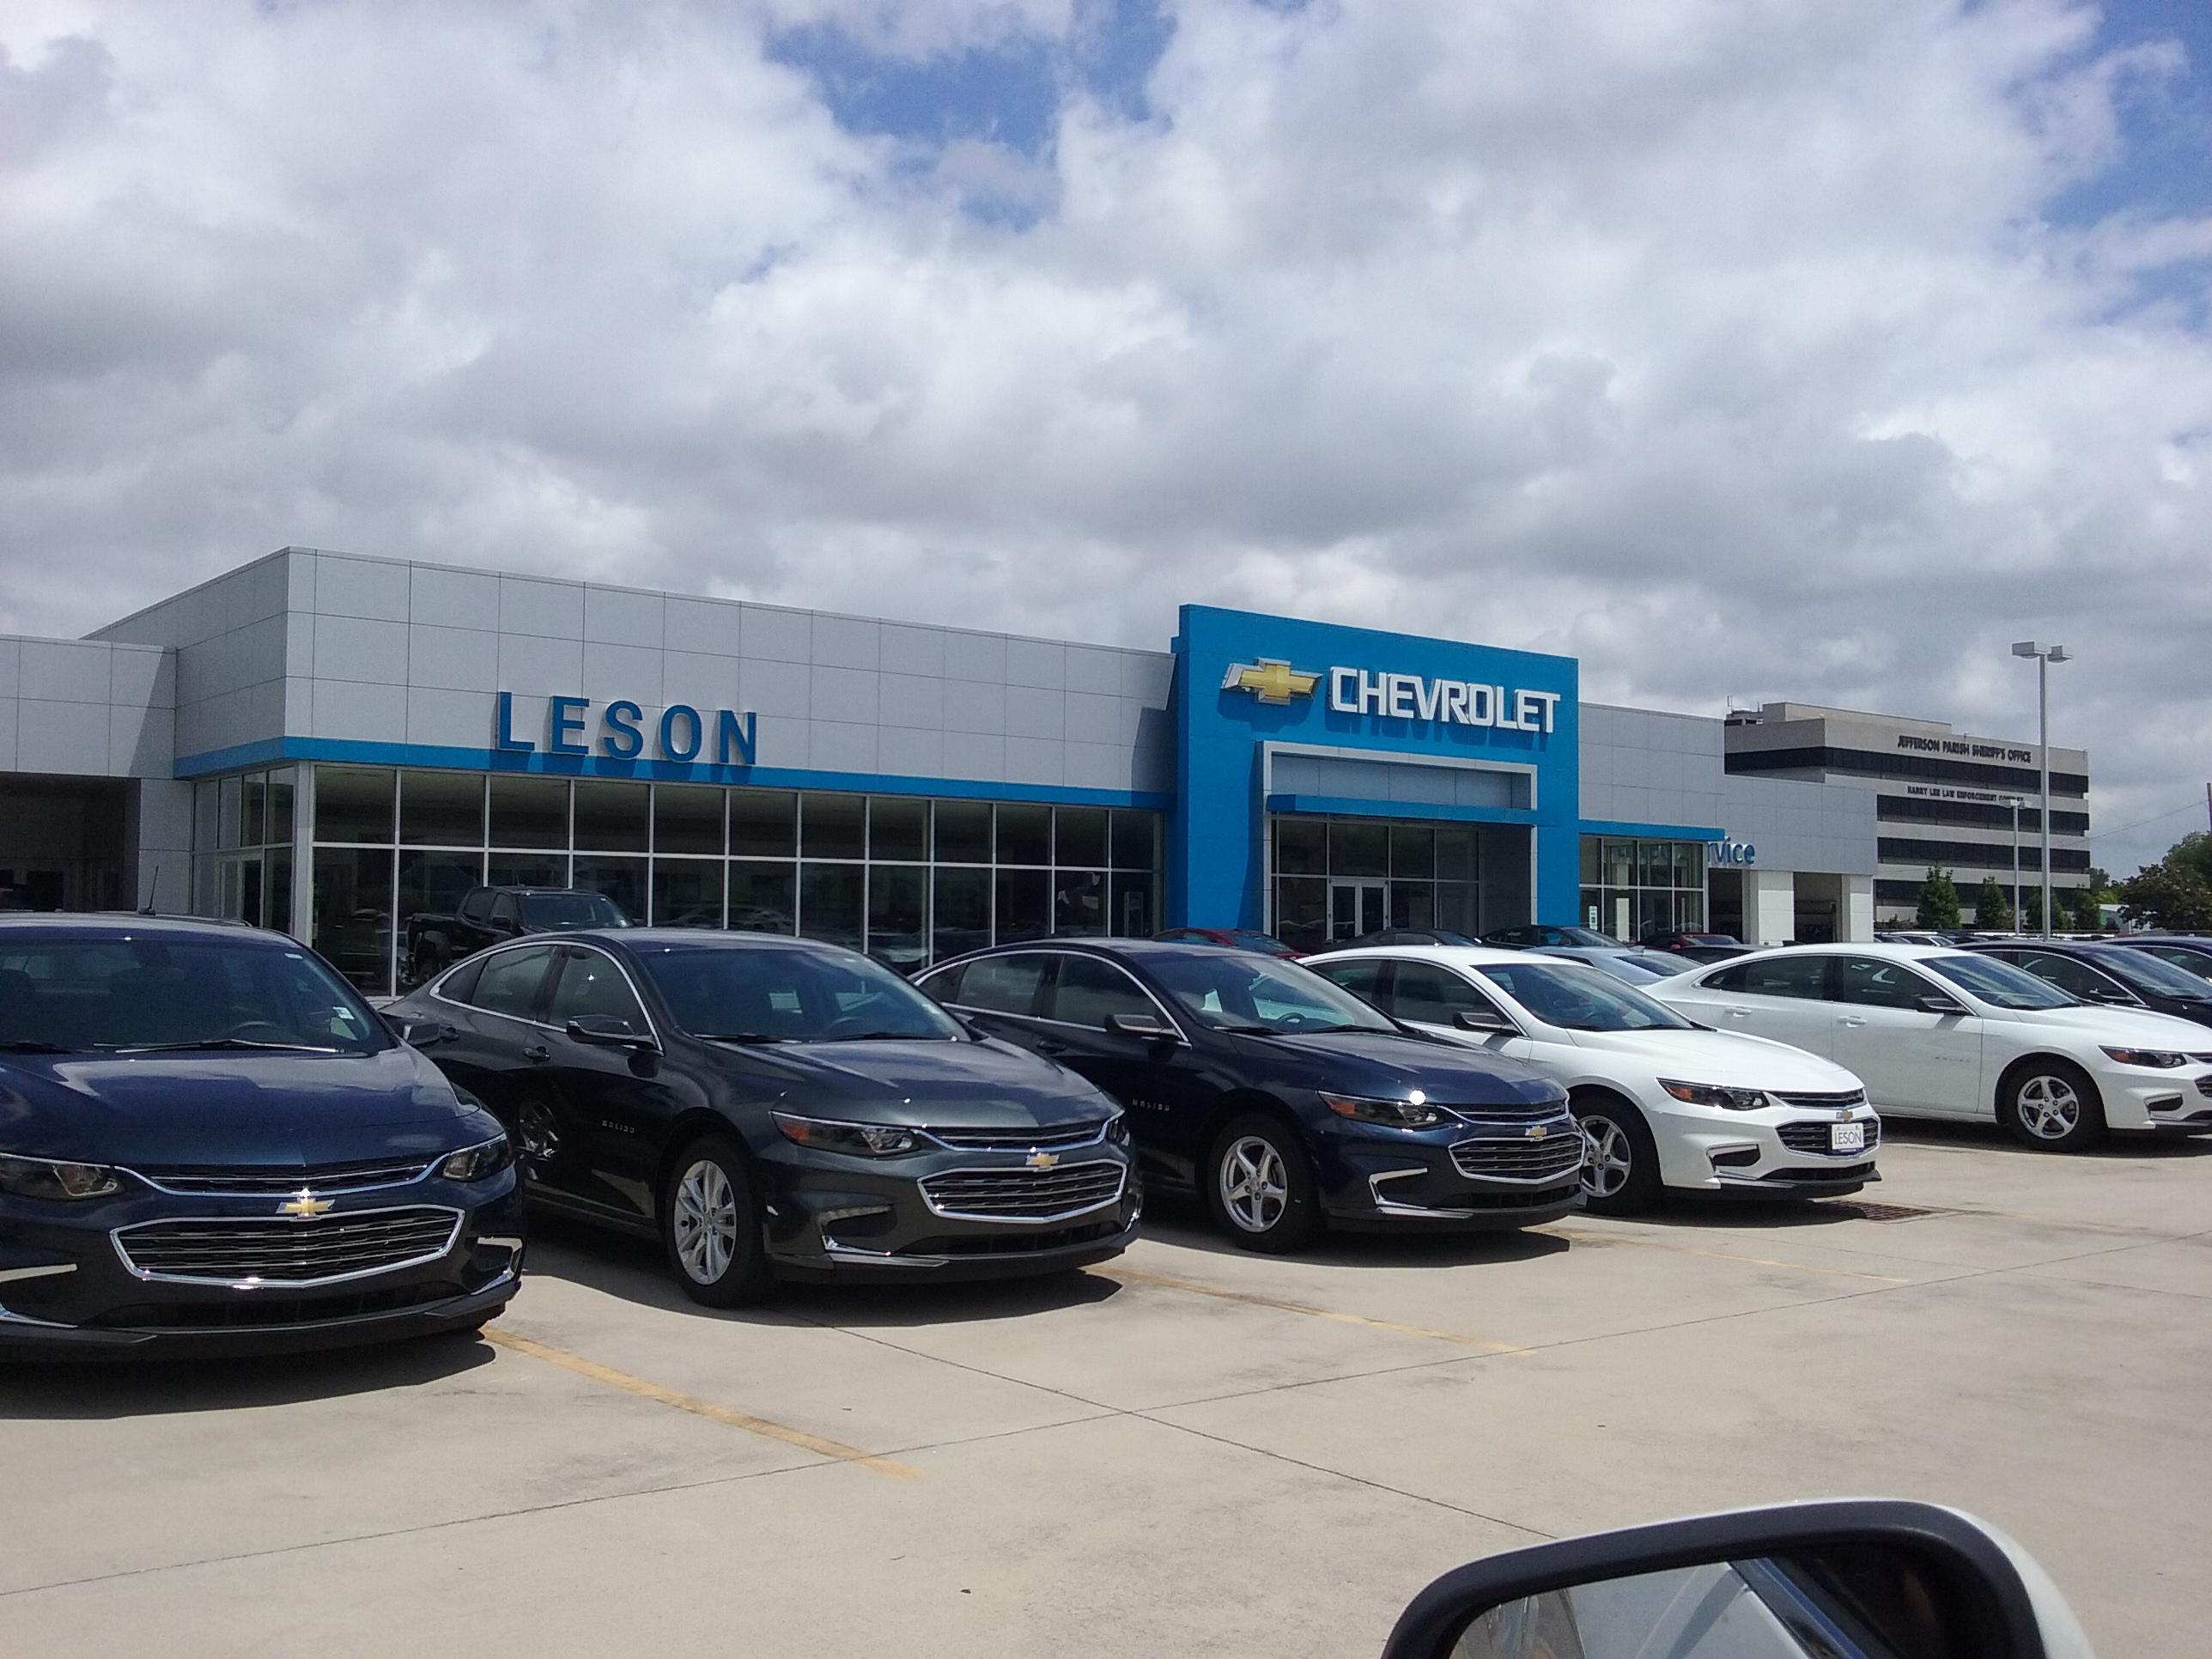 Leson Chevrolet In Harvey La 70058 Chamberofcommerce Com